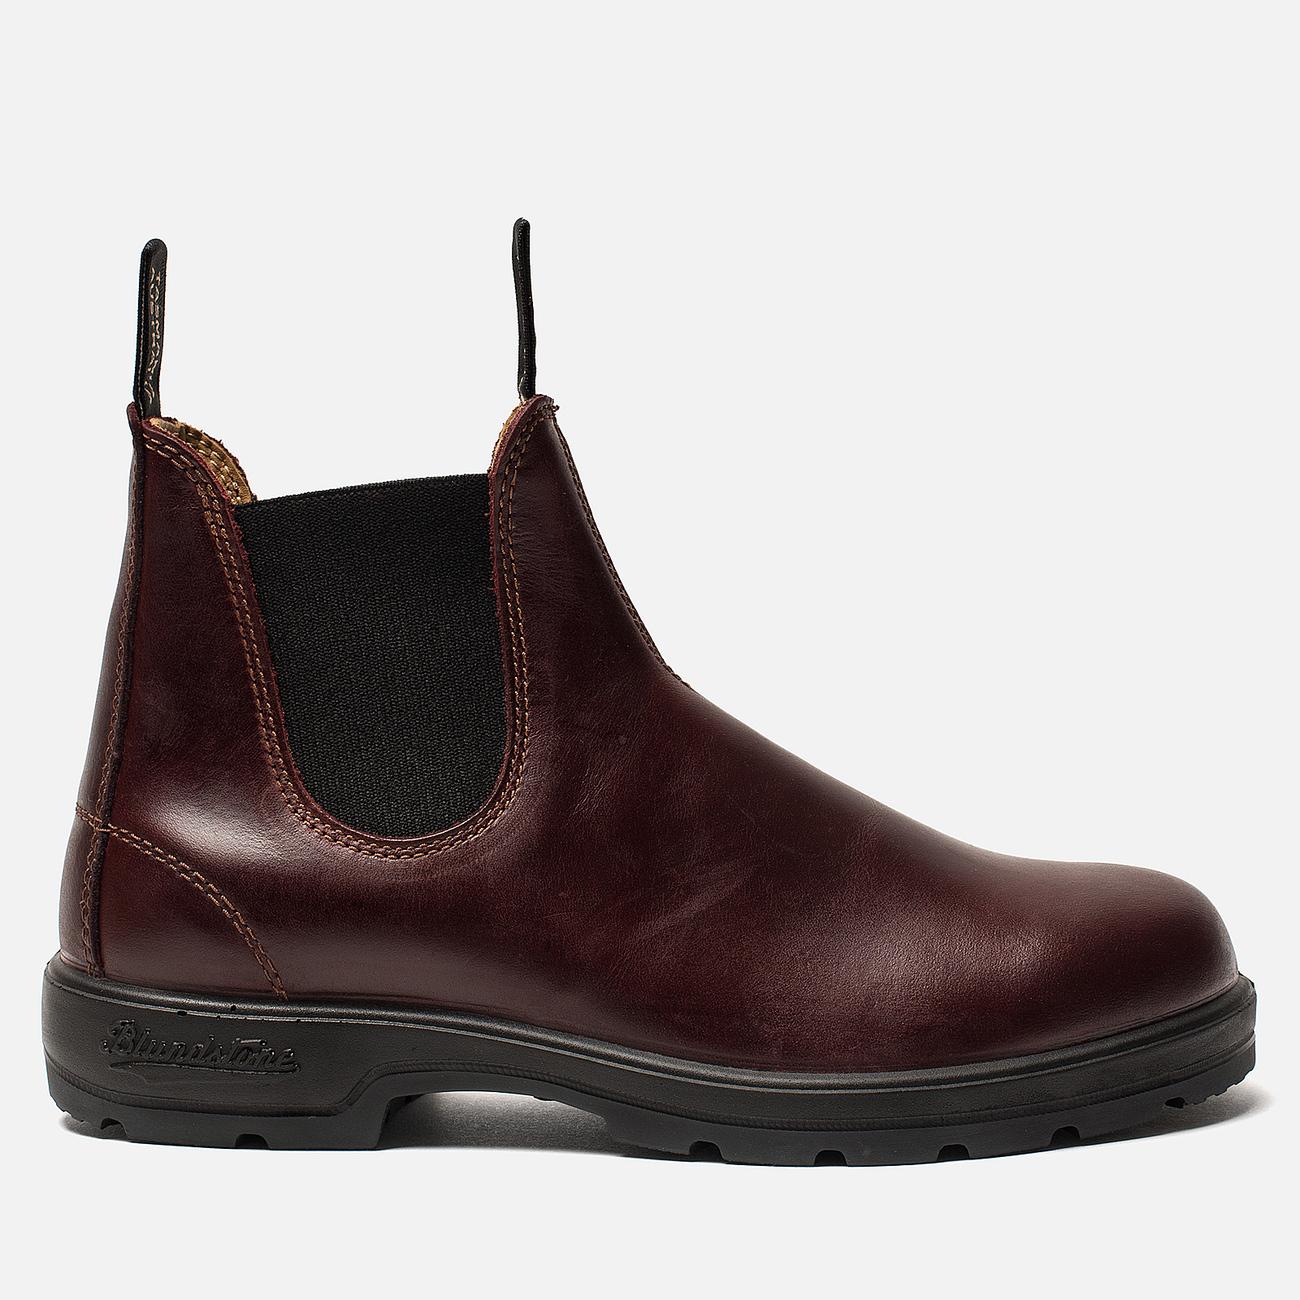 Ботинки Blundstone 1440 Leather Lined Redwood